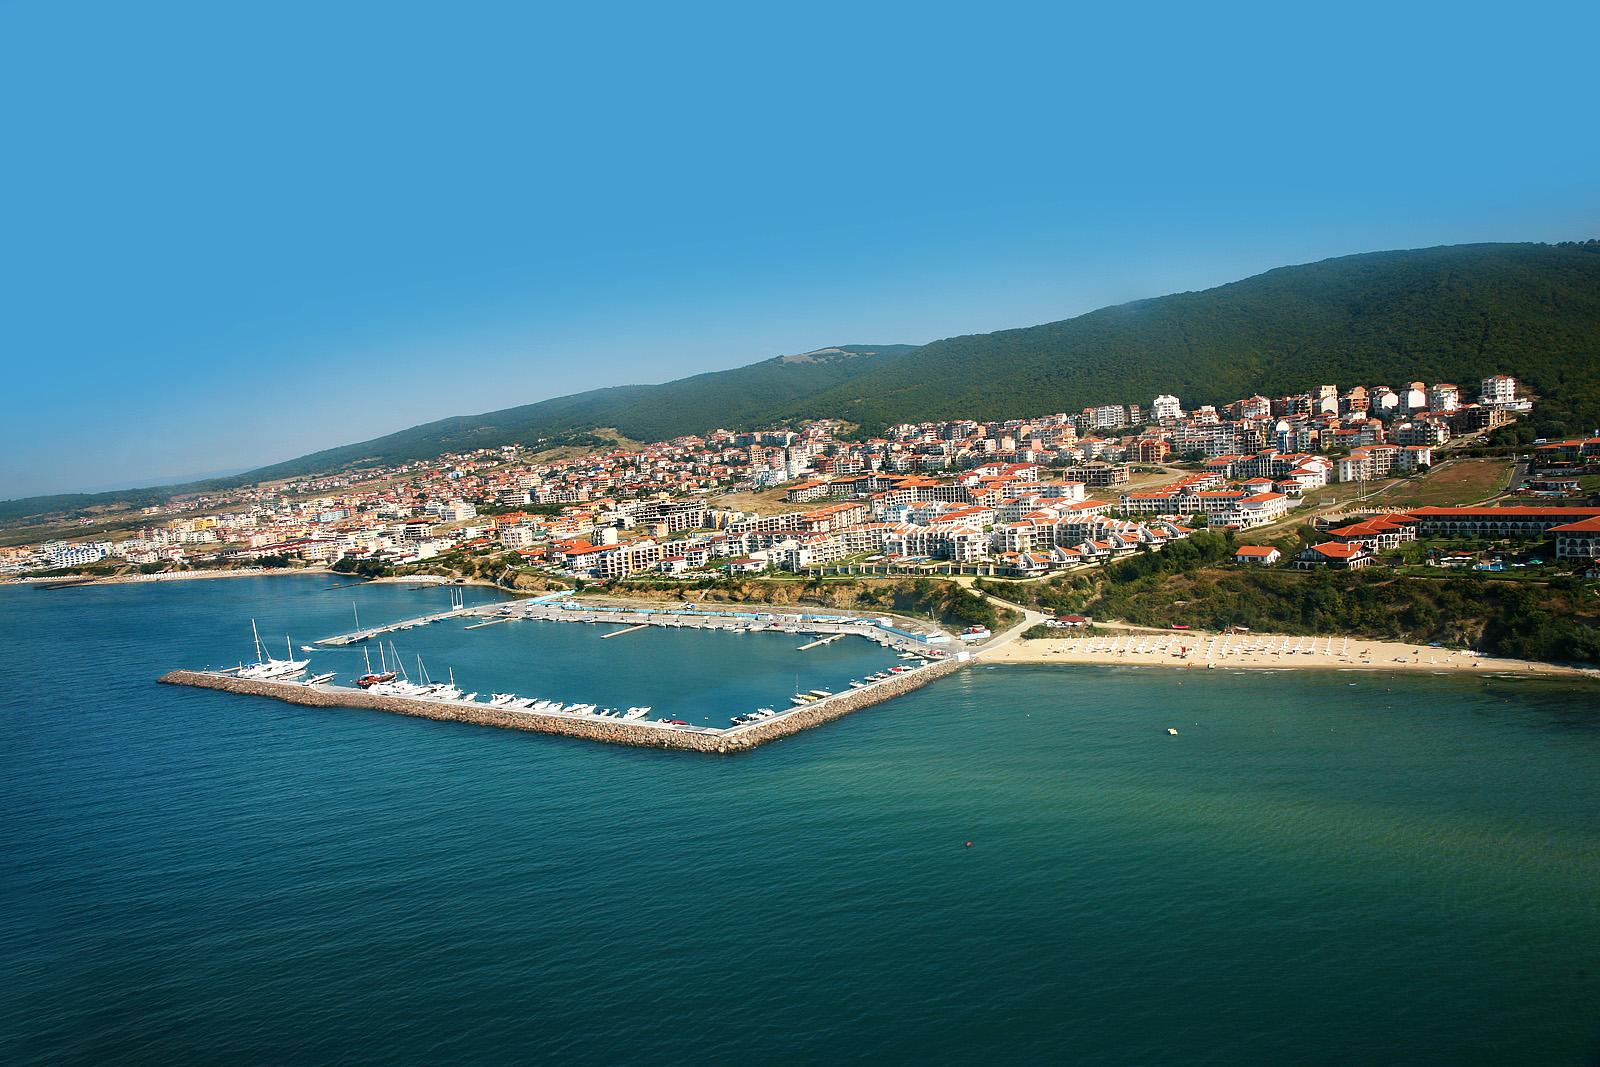 http://upload.wikimedia.org/wikipedia/commons/6/65/Dinevi_marina_at_St_Vlas_resort.jpg